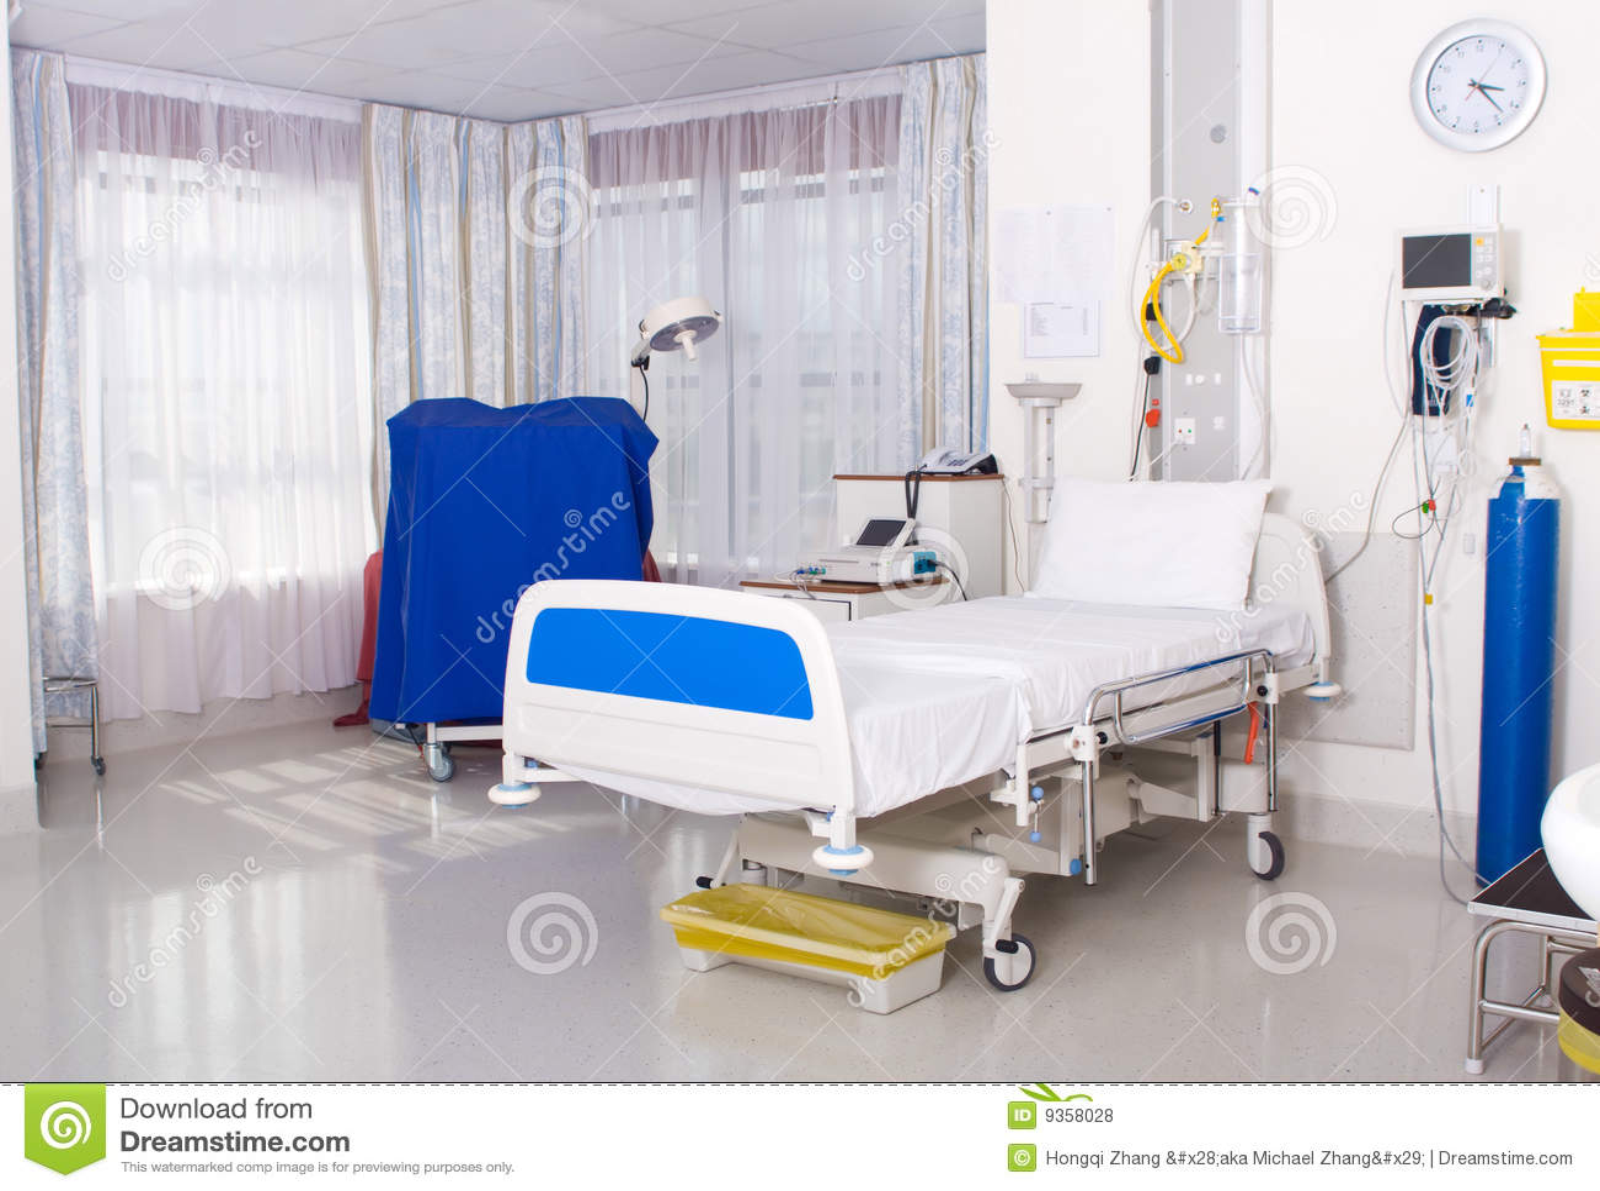 Hospital ward stock photo. Image of hospital, help, disease - 9358028